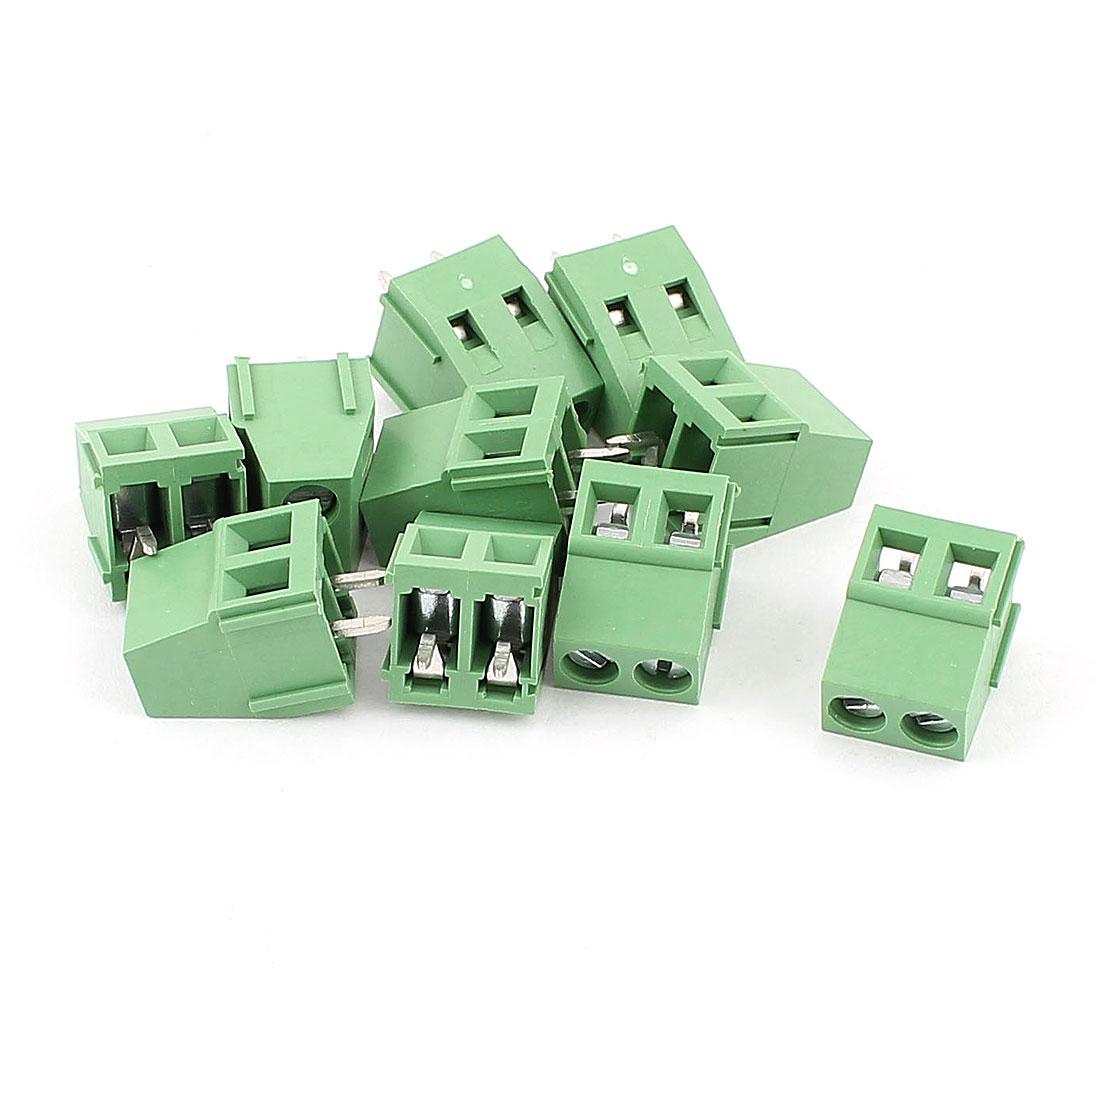 10 Pcs AC 300V 10A PCB Terminal Block Connector 5.0mm Pitch Green